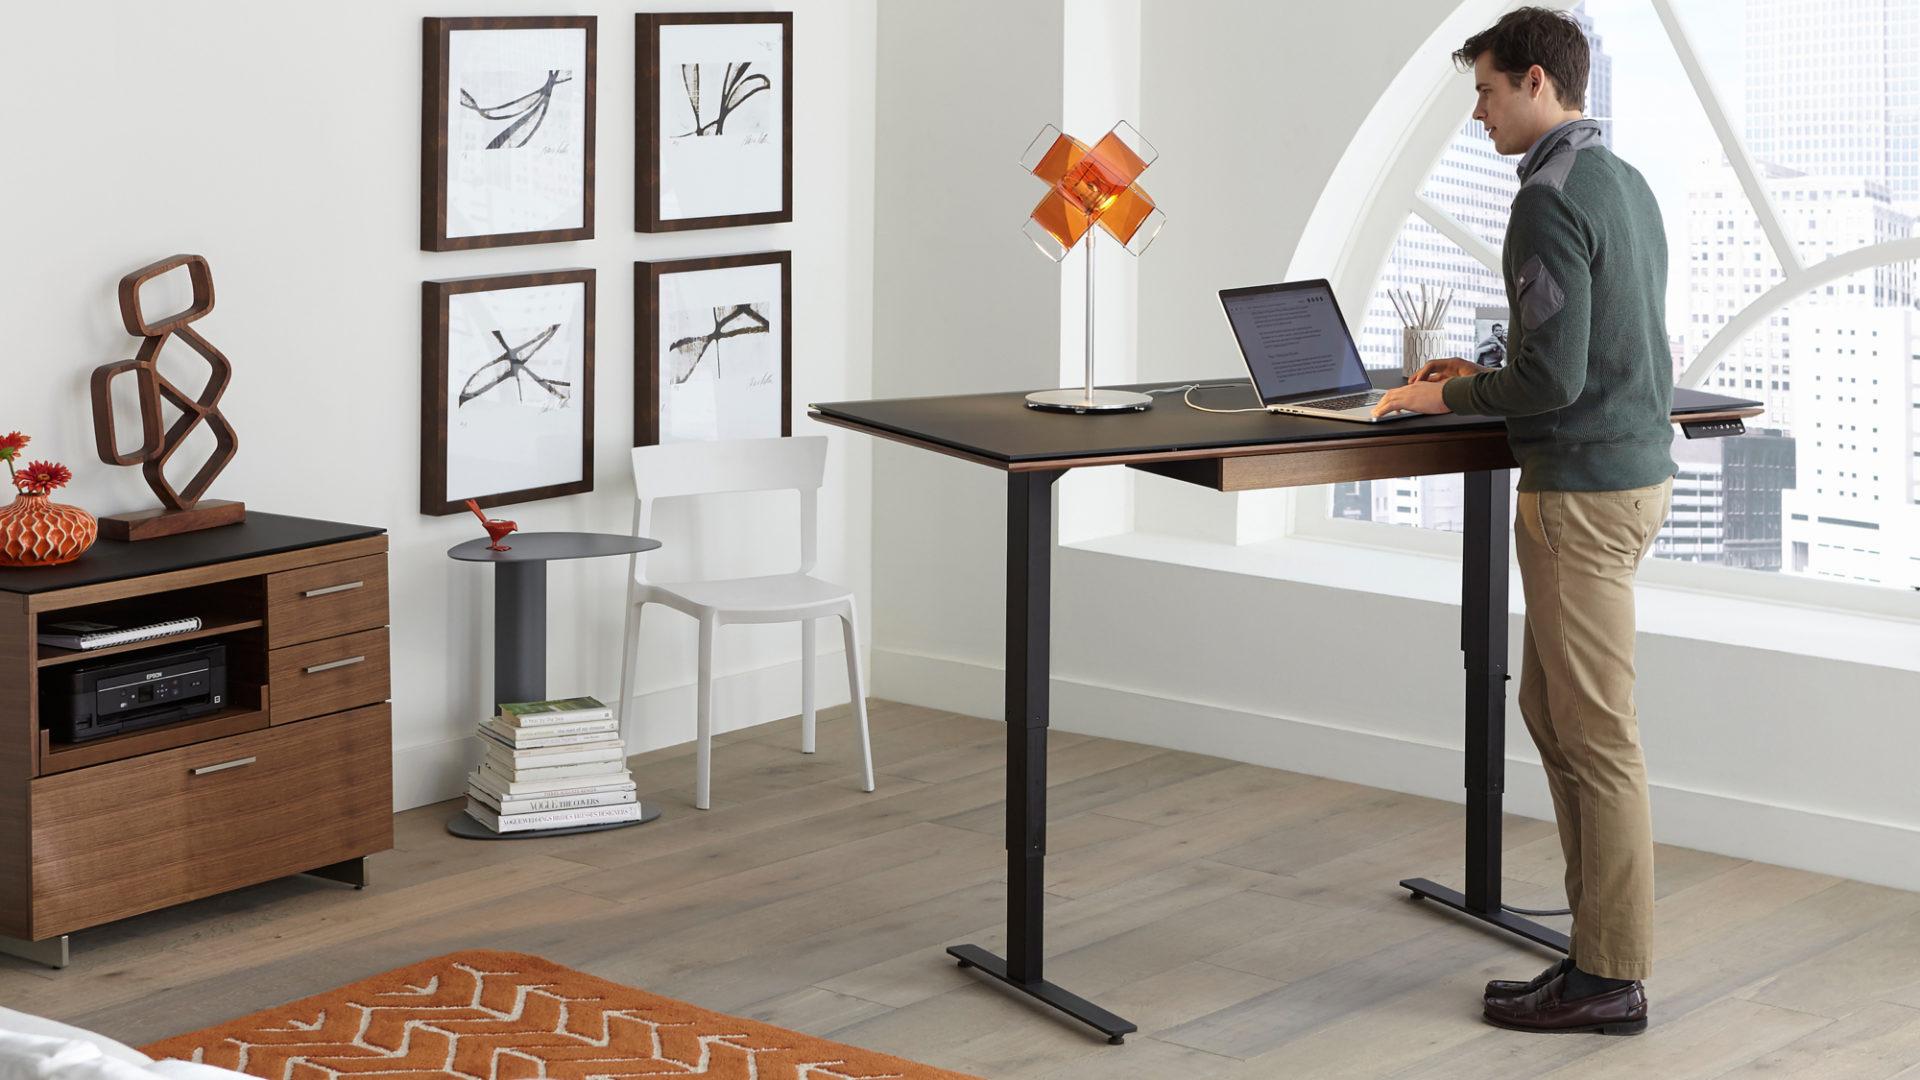 Lift Standing Desks, Stand Up Desks, and Sit+Stand Desks  BDI